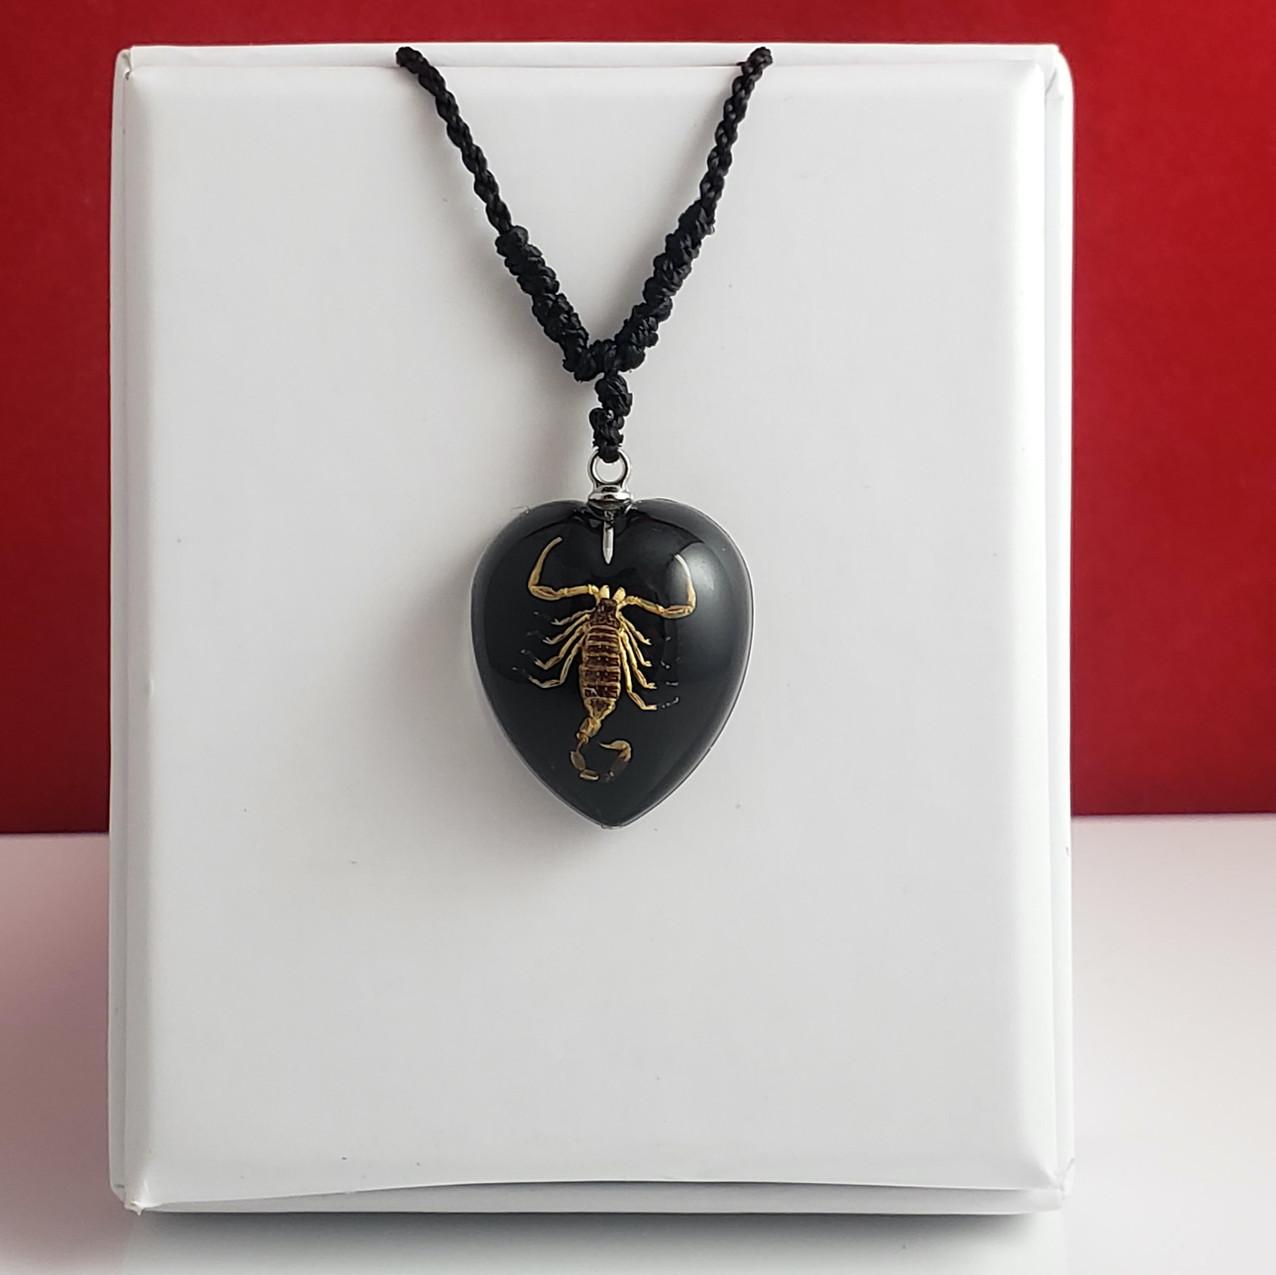 Gold Scorpion Black Heart